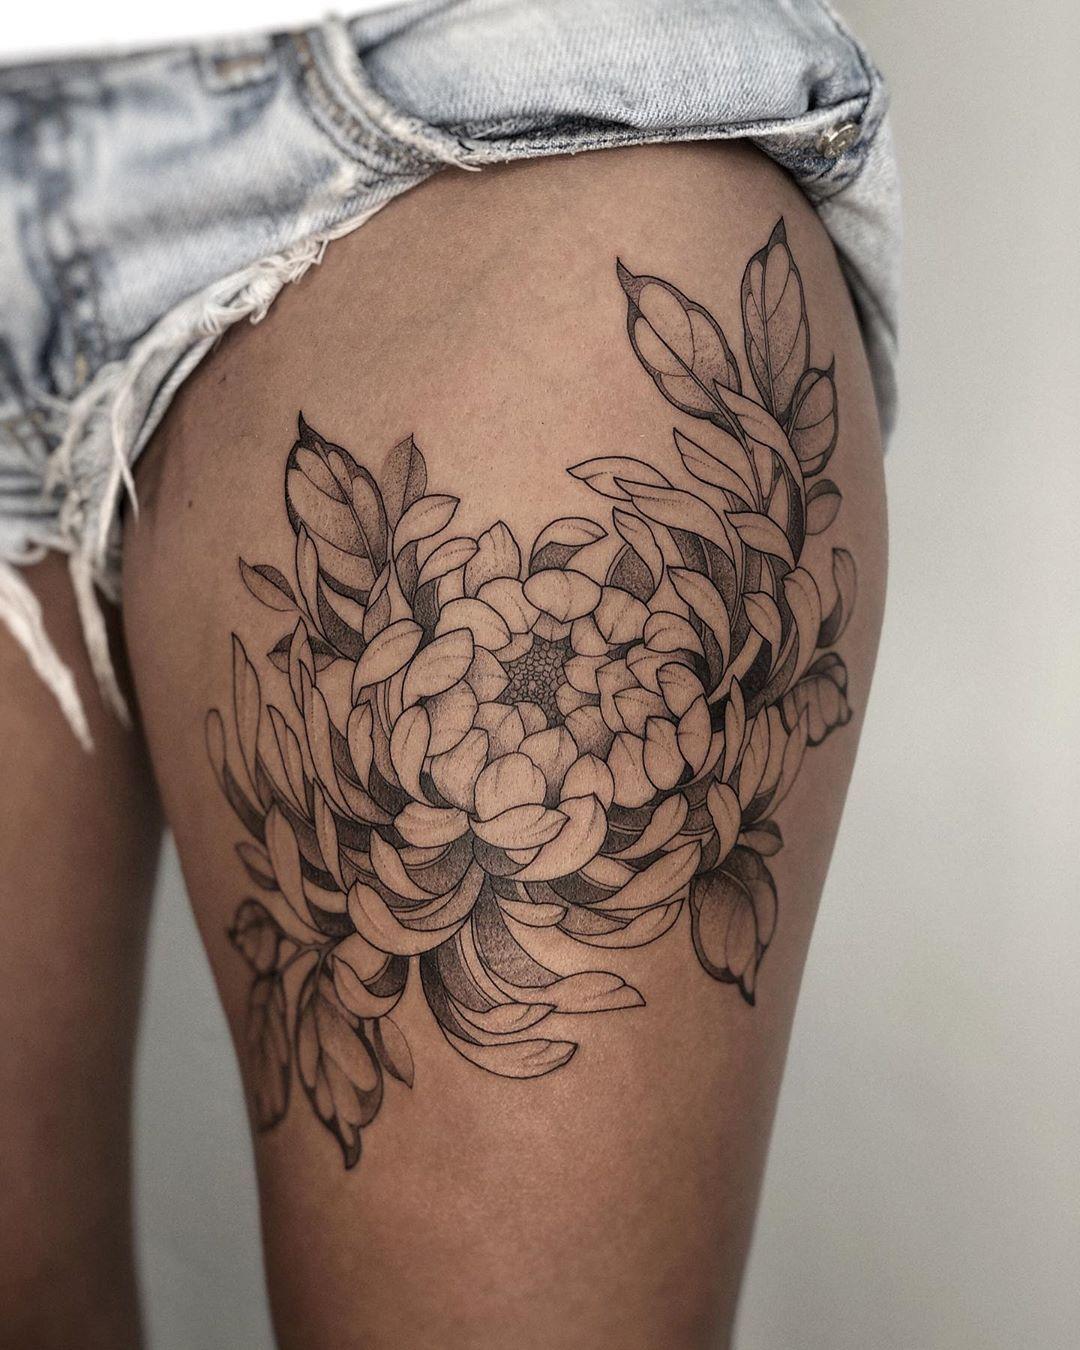 Pin by Daniela DottaiRamos on Tattoos in 2020 Tattoos